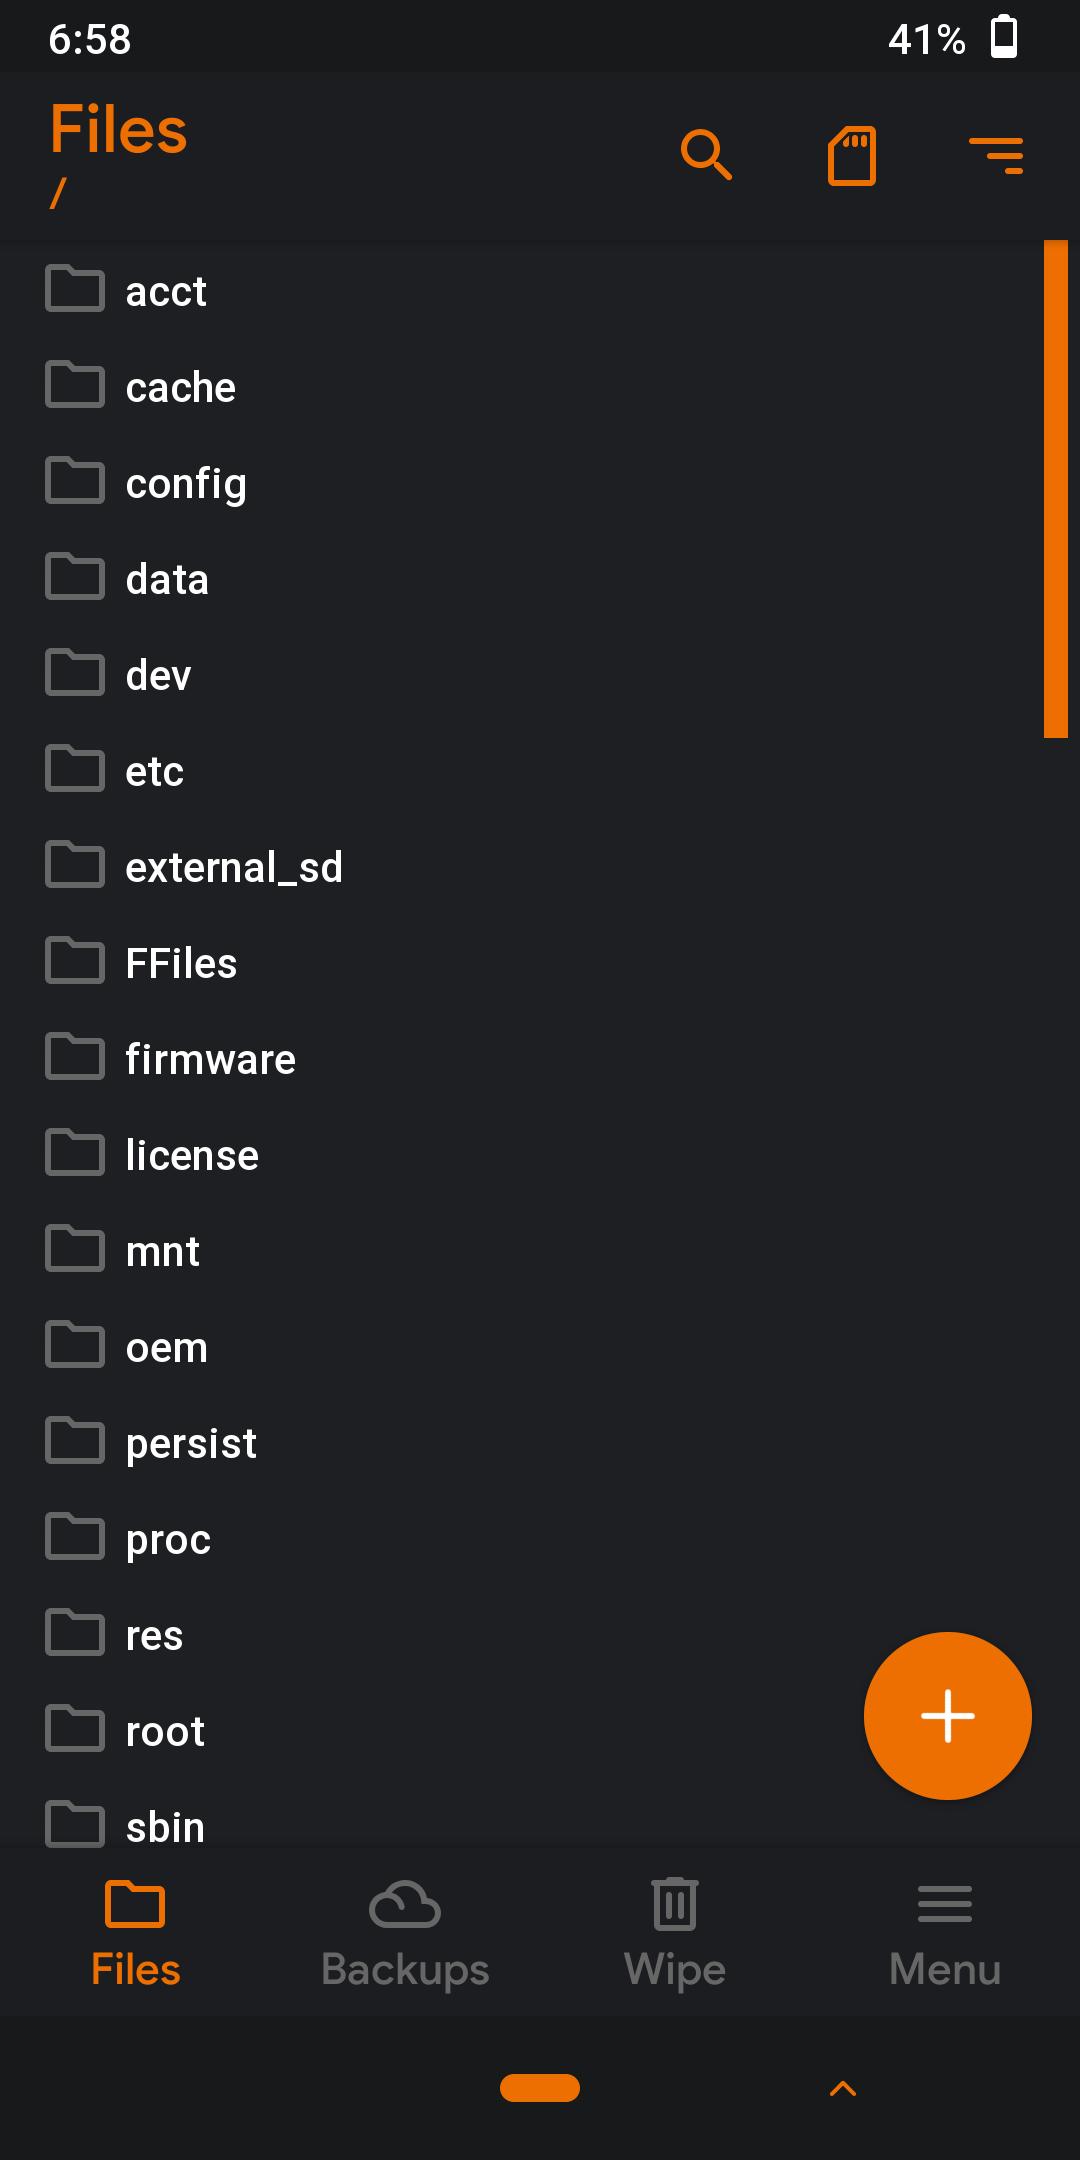 Screenshot 2019 05 15 06 58 54 - Recovery Orange Fox No Mi 9T - Redmi K20